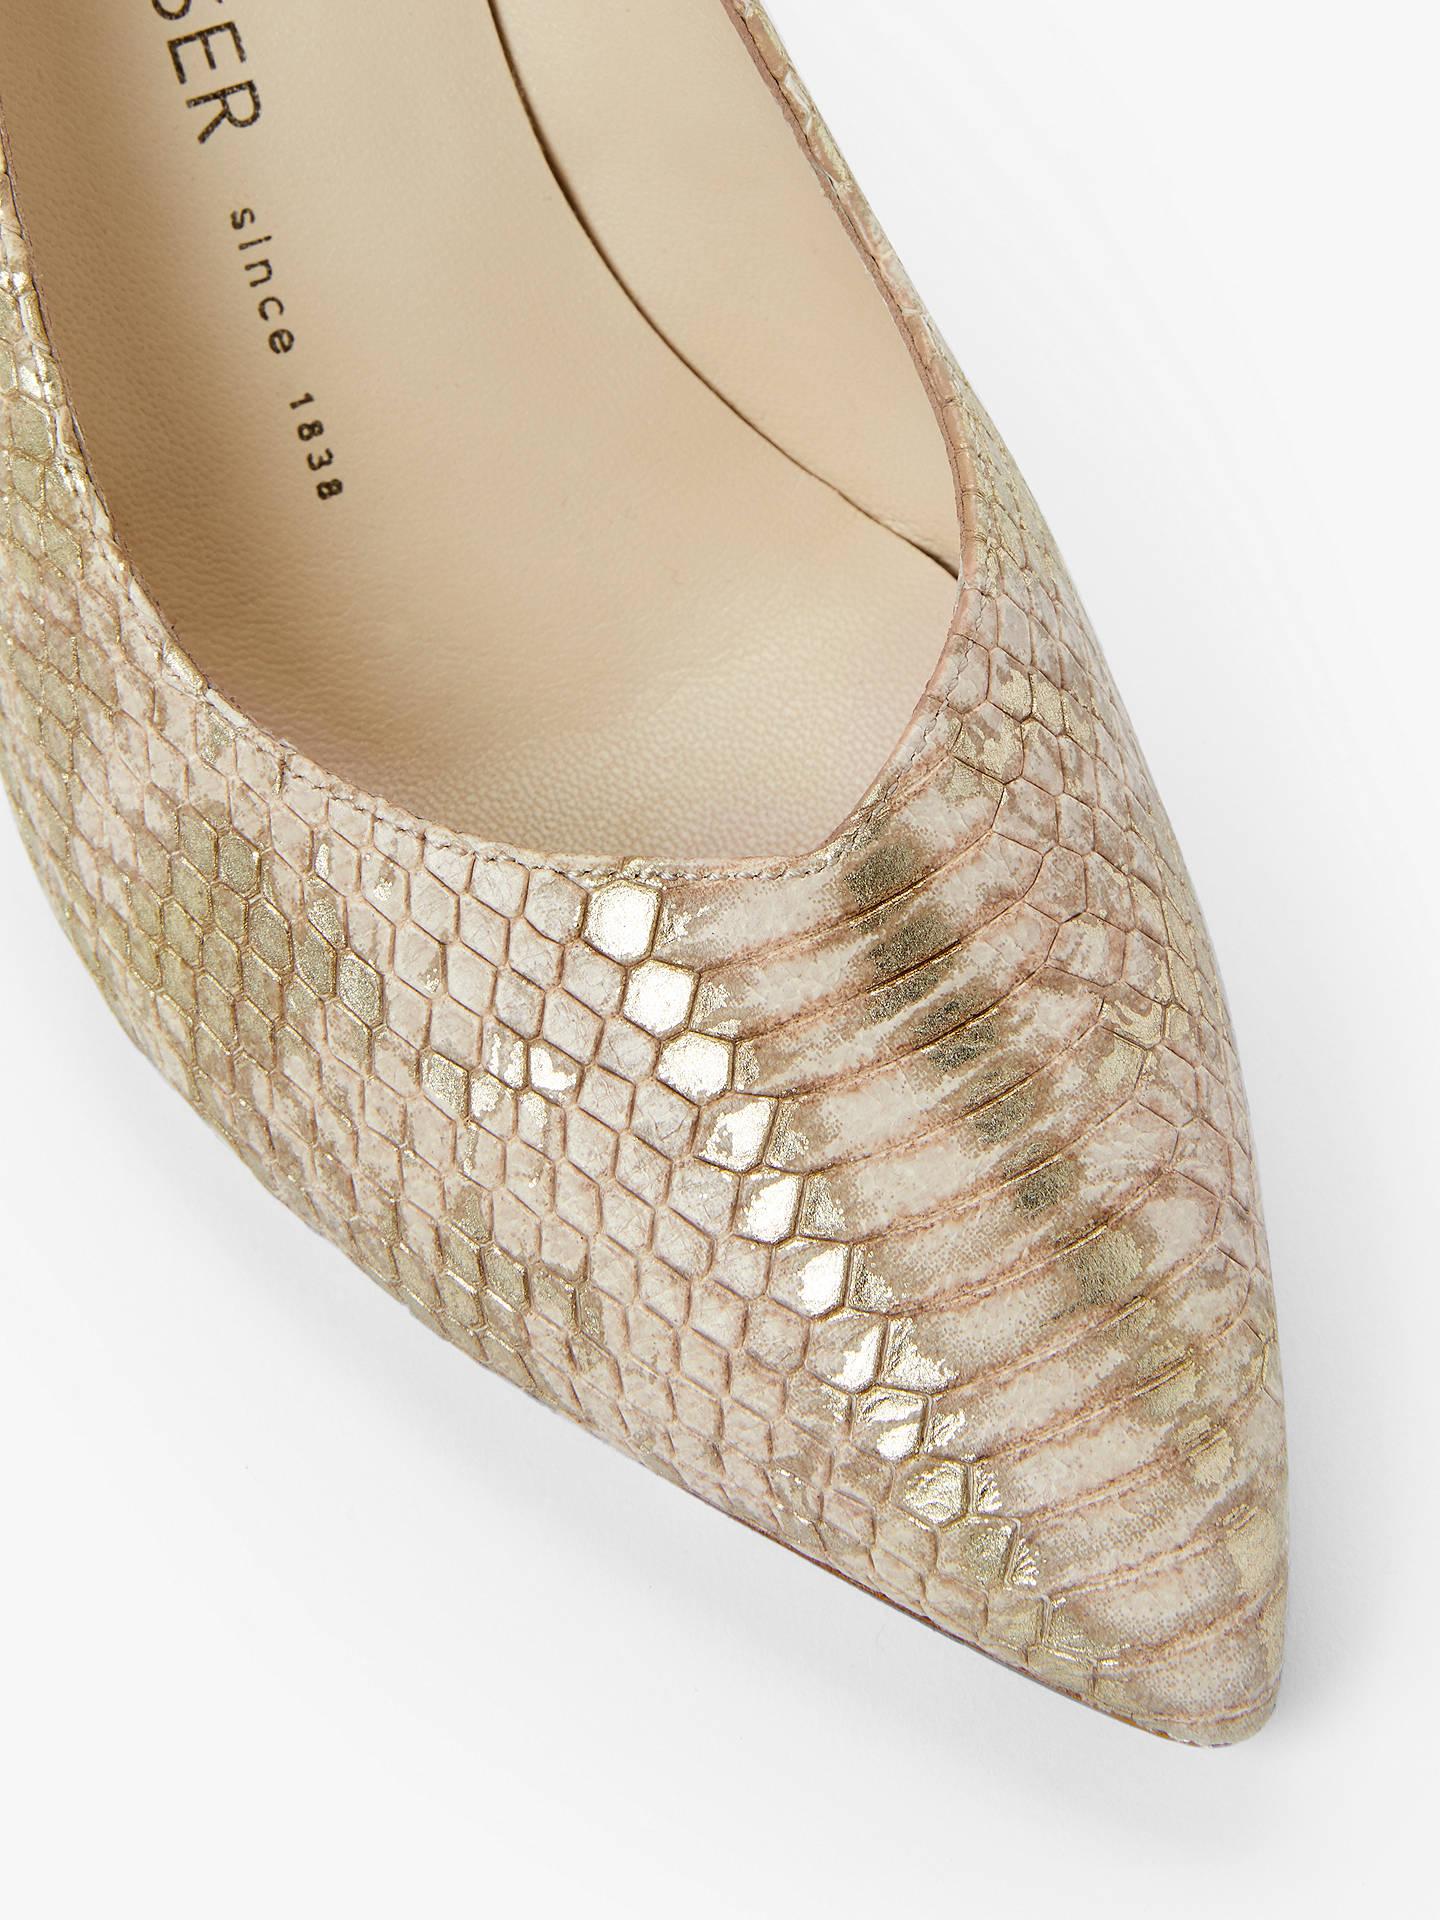 online store cacbe 64c68 Peter Kaiser Elfi Stiletto Heel Court Shoes, Natural Snake ...